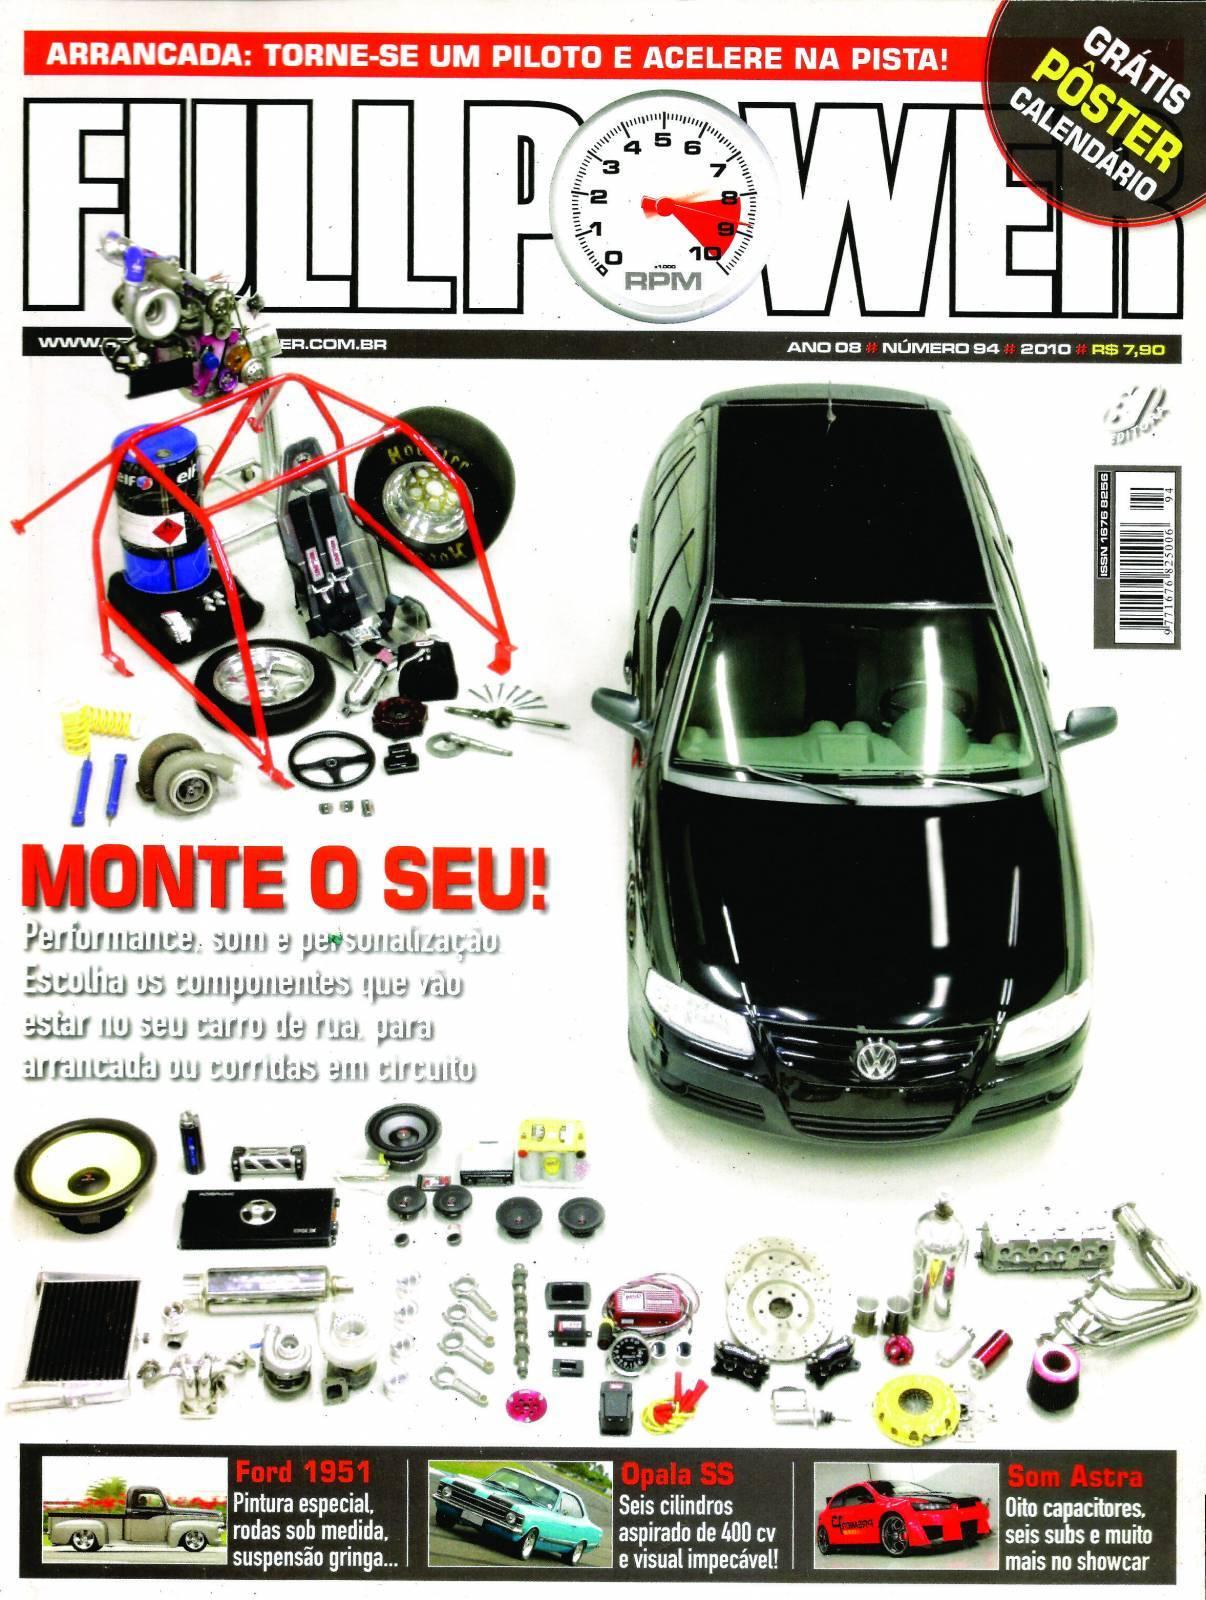 REVISTA FULLPOWER No. 94 ANO 2010 - Loja FullPower